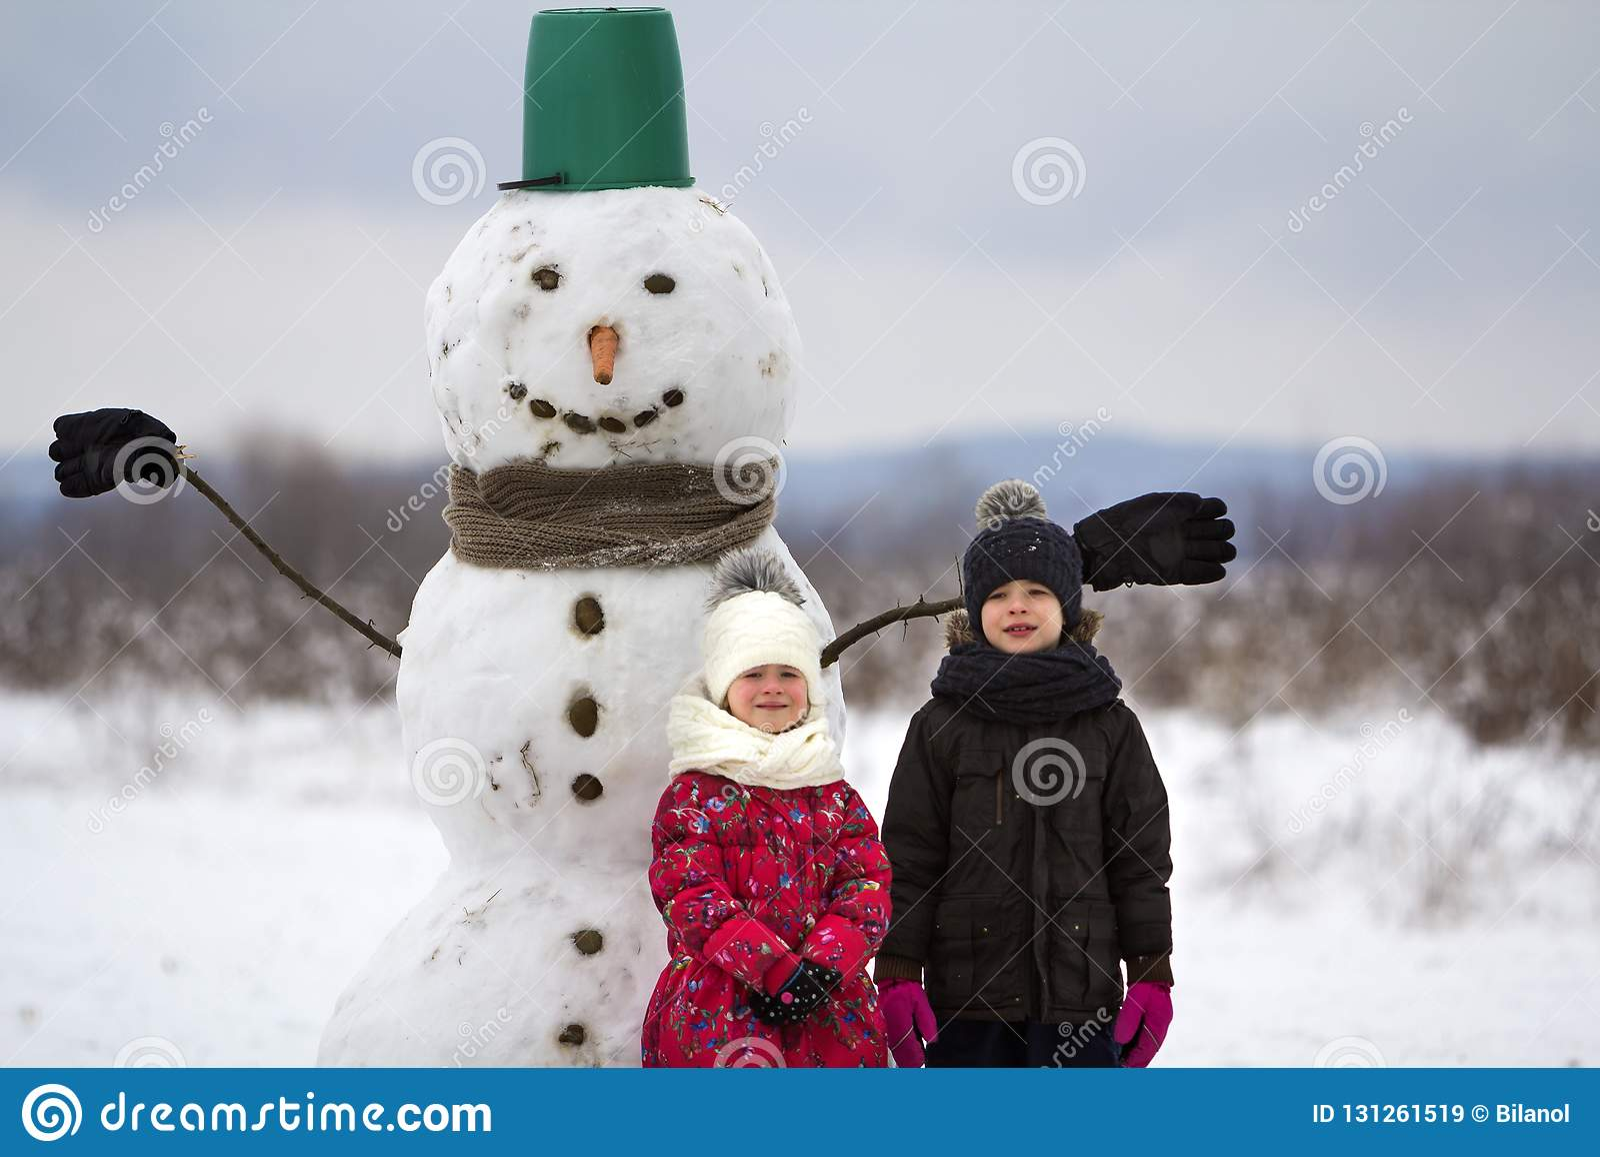 cdb8afc3a62 Two Cute Children